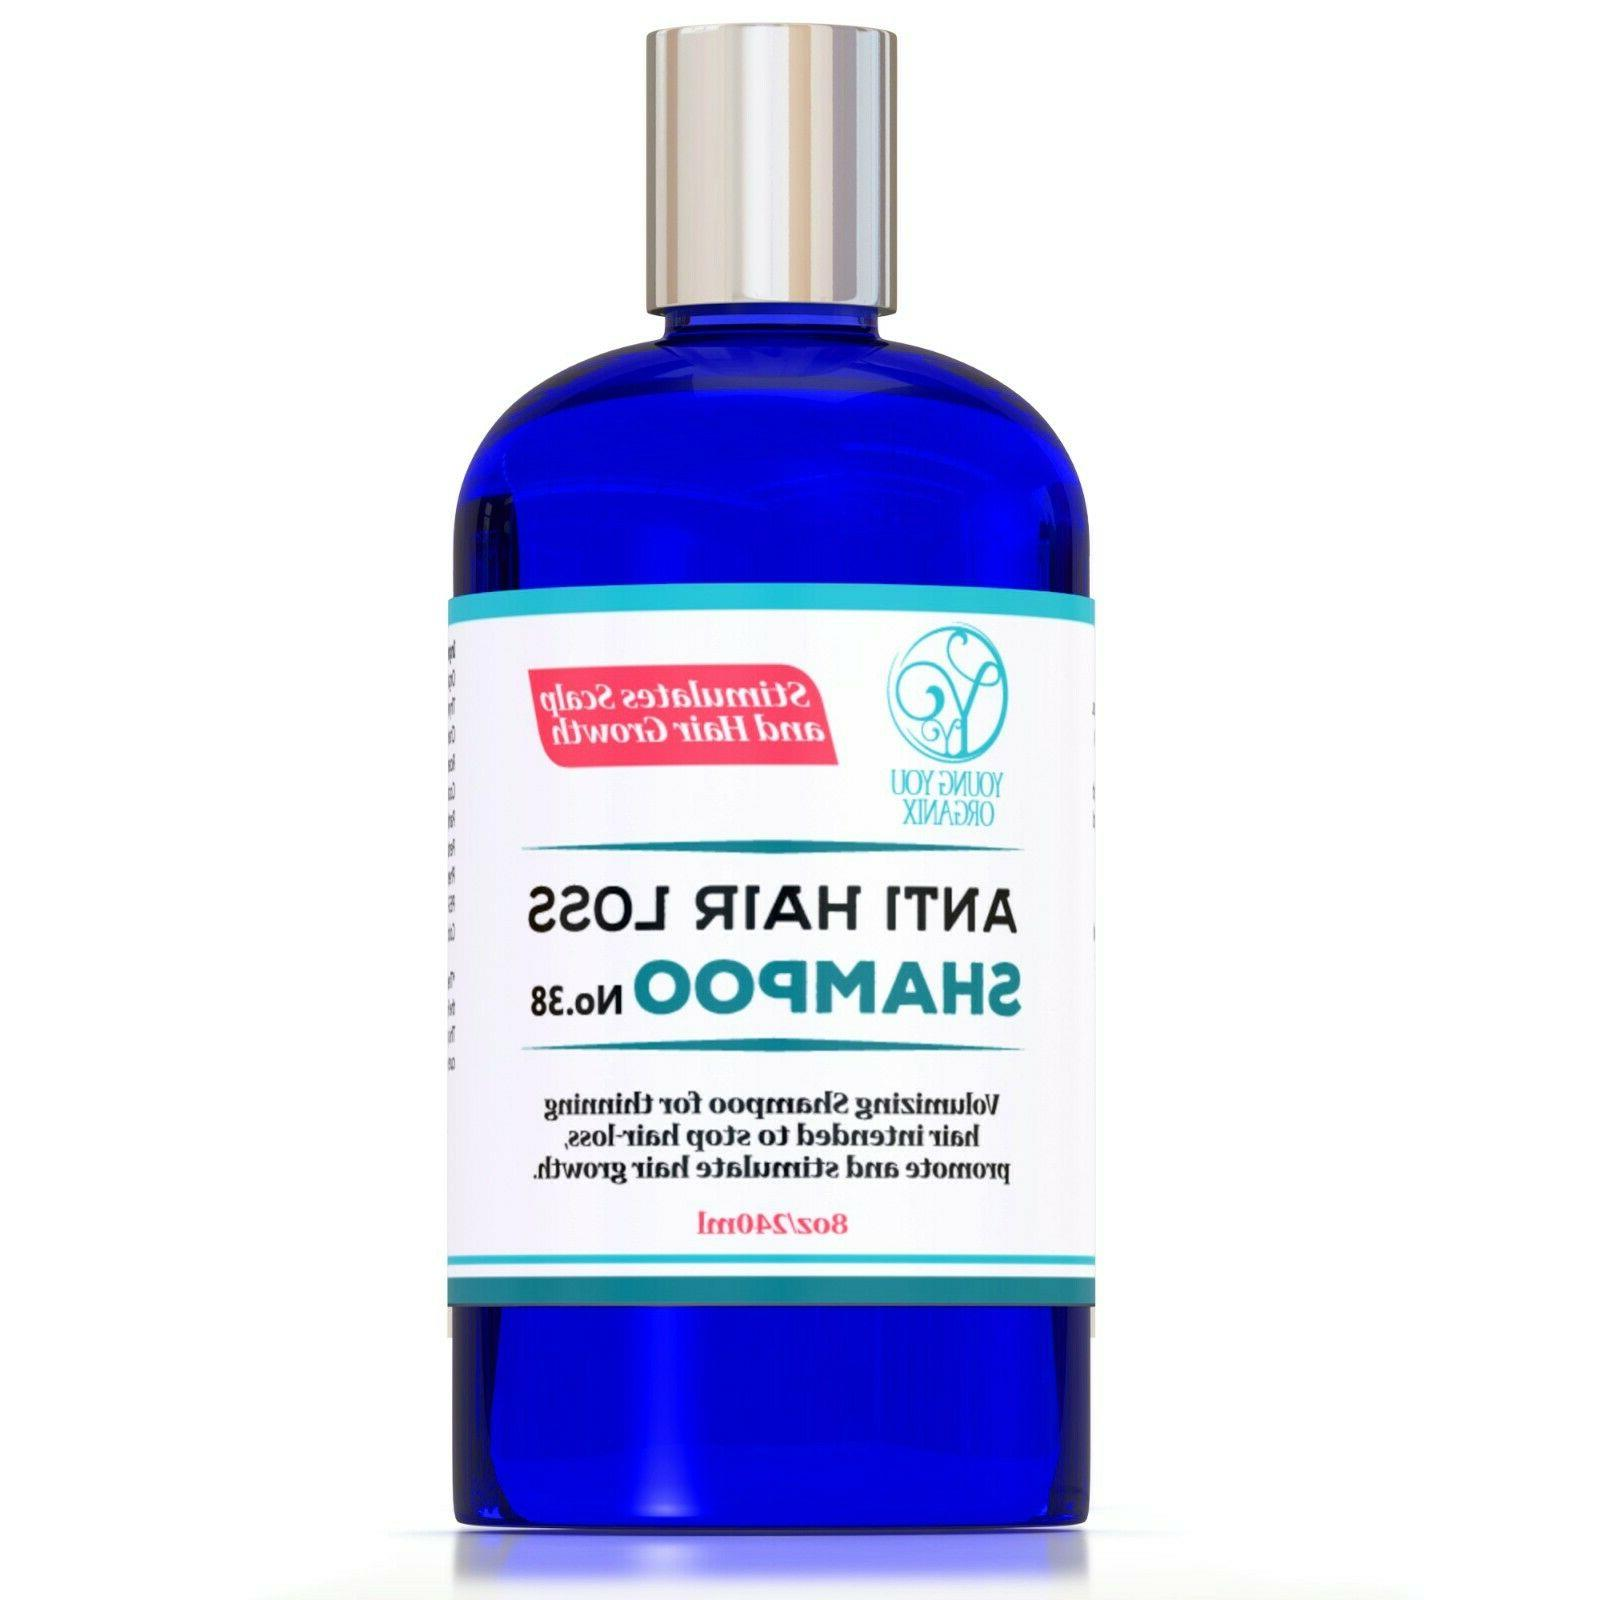 hair loss shampoo stimulates scalp and hair